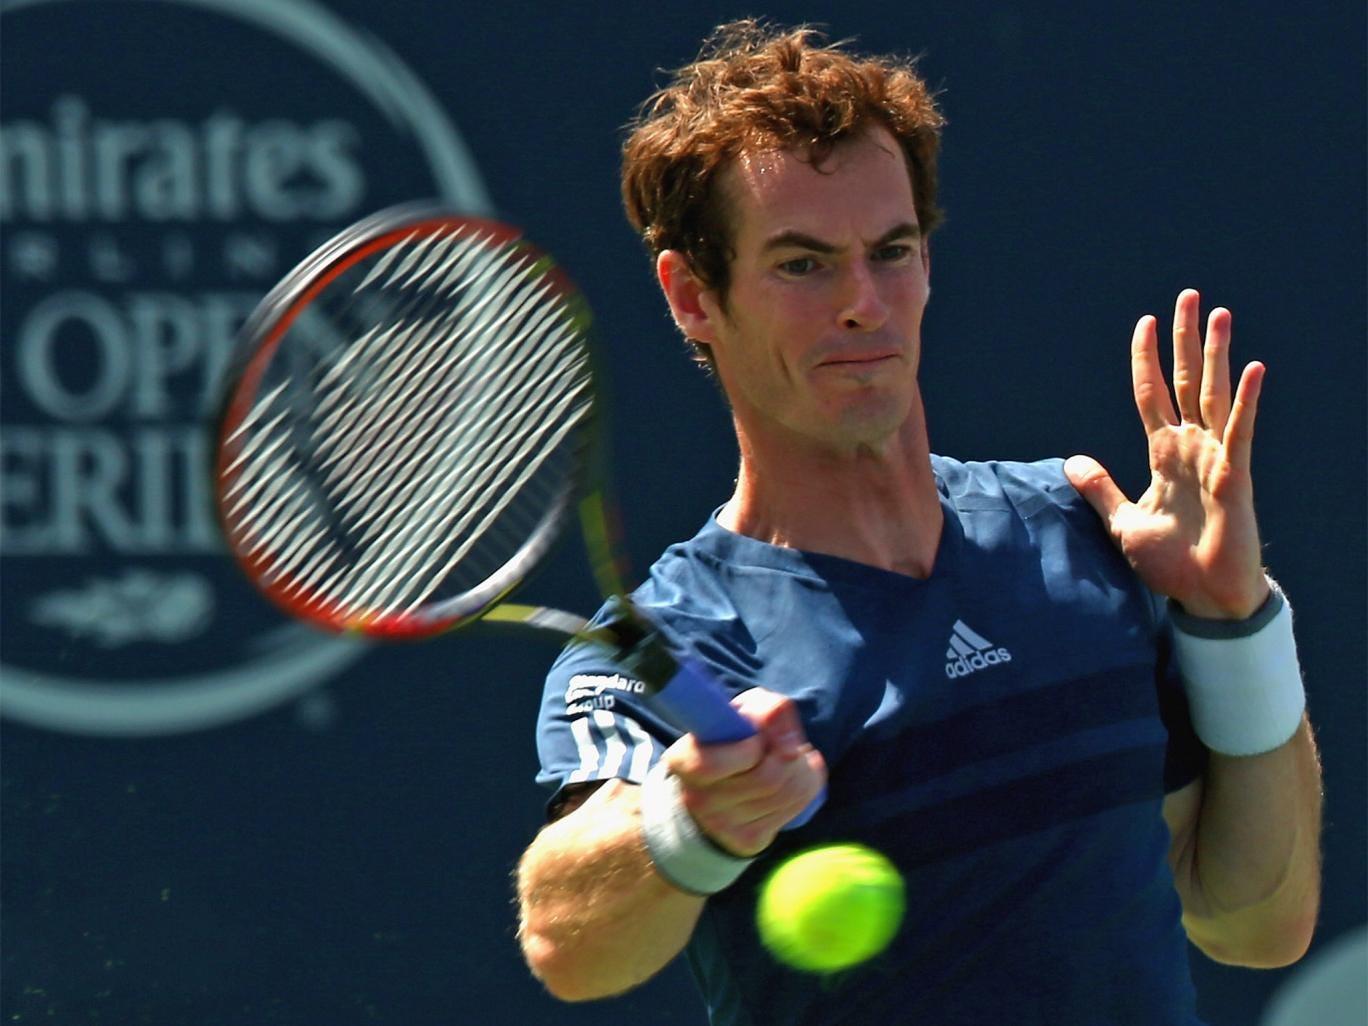 Britain's Andy Murray returns a shot to Australia's Nick Kyrgios in Toronto